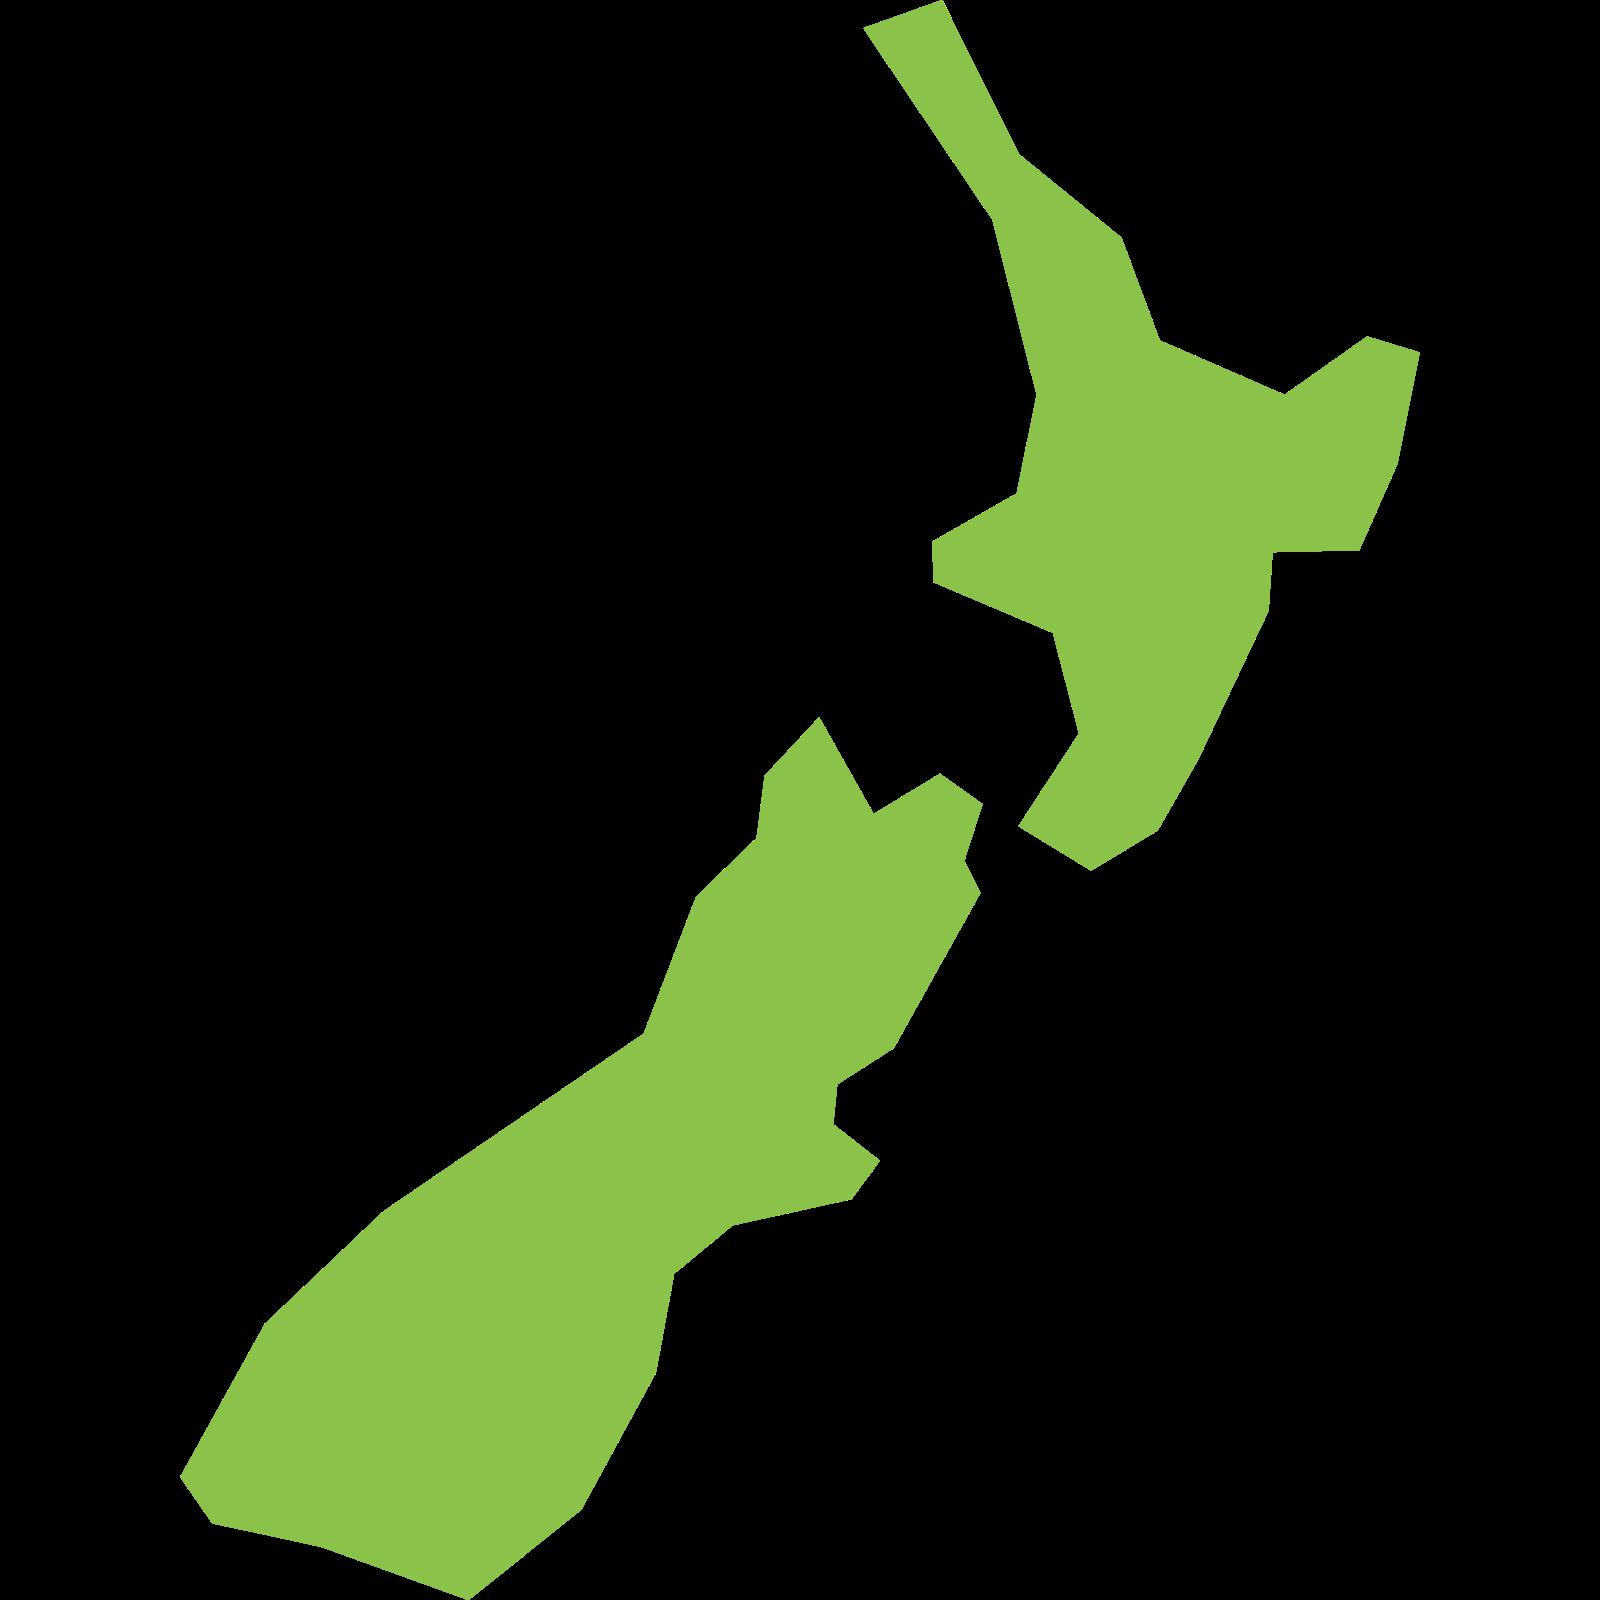 Nowa Zelandia Kraj icon